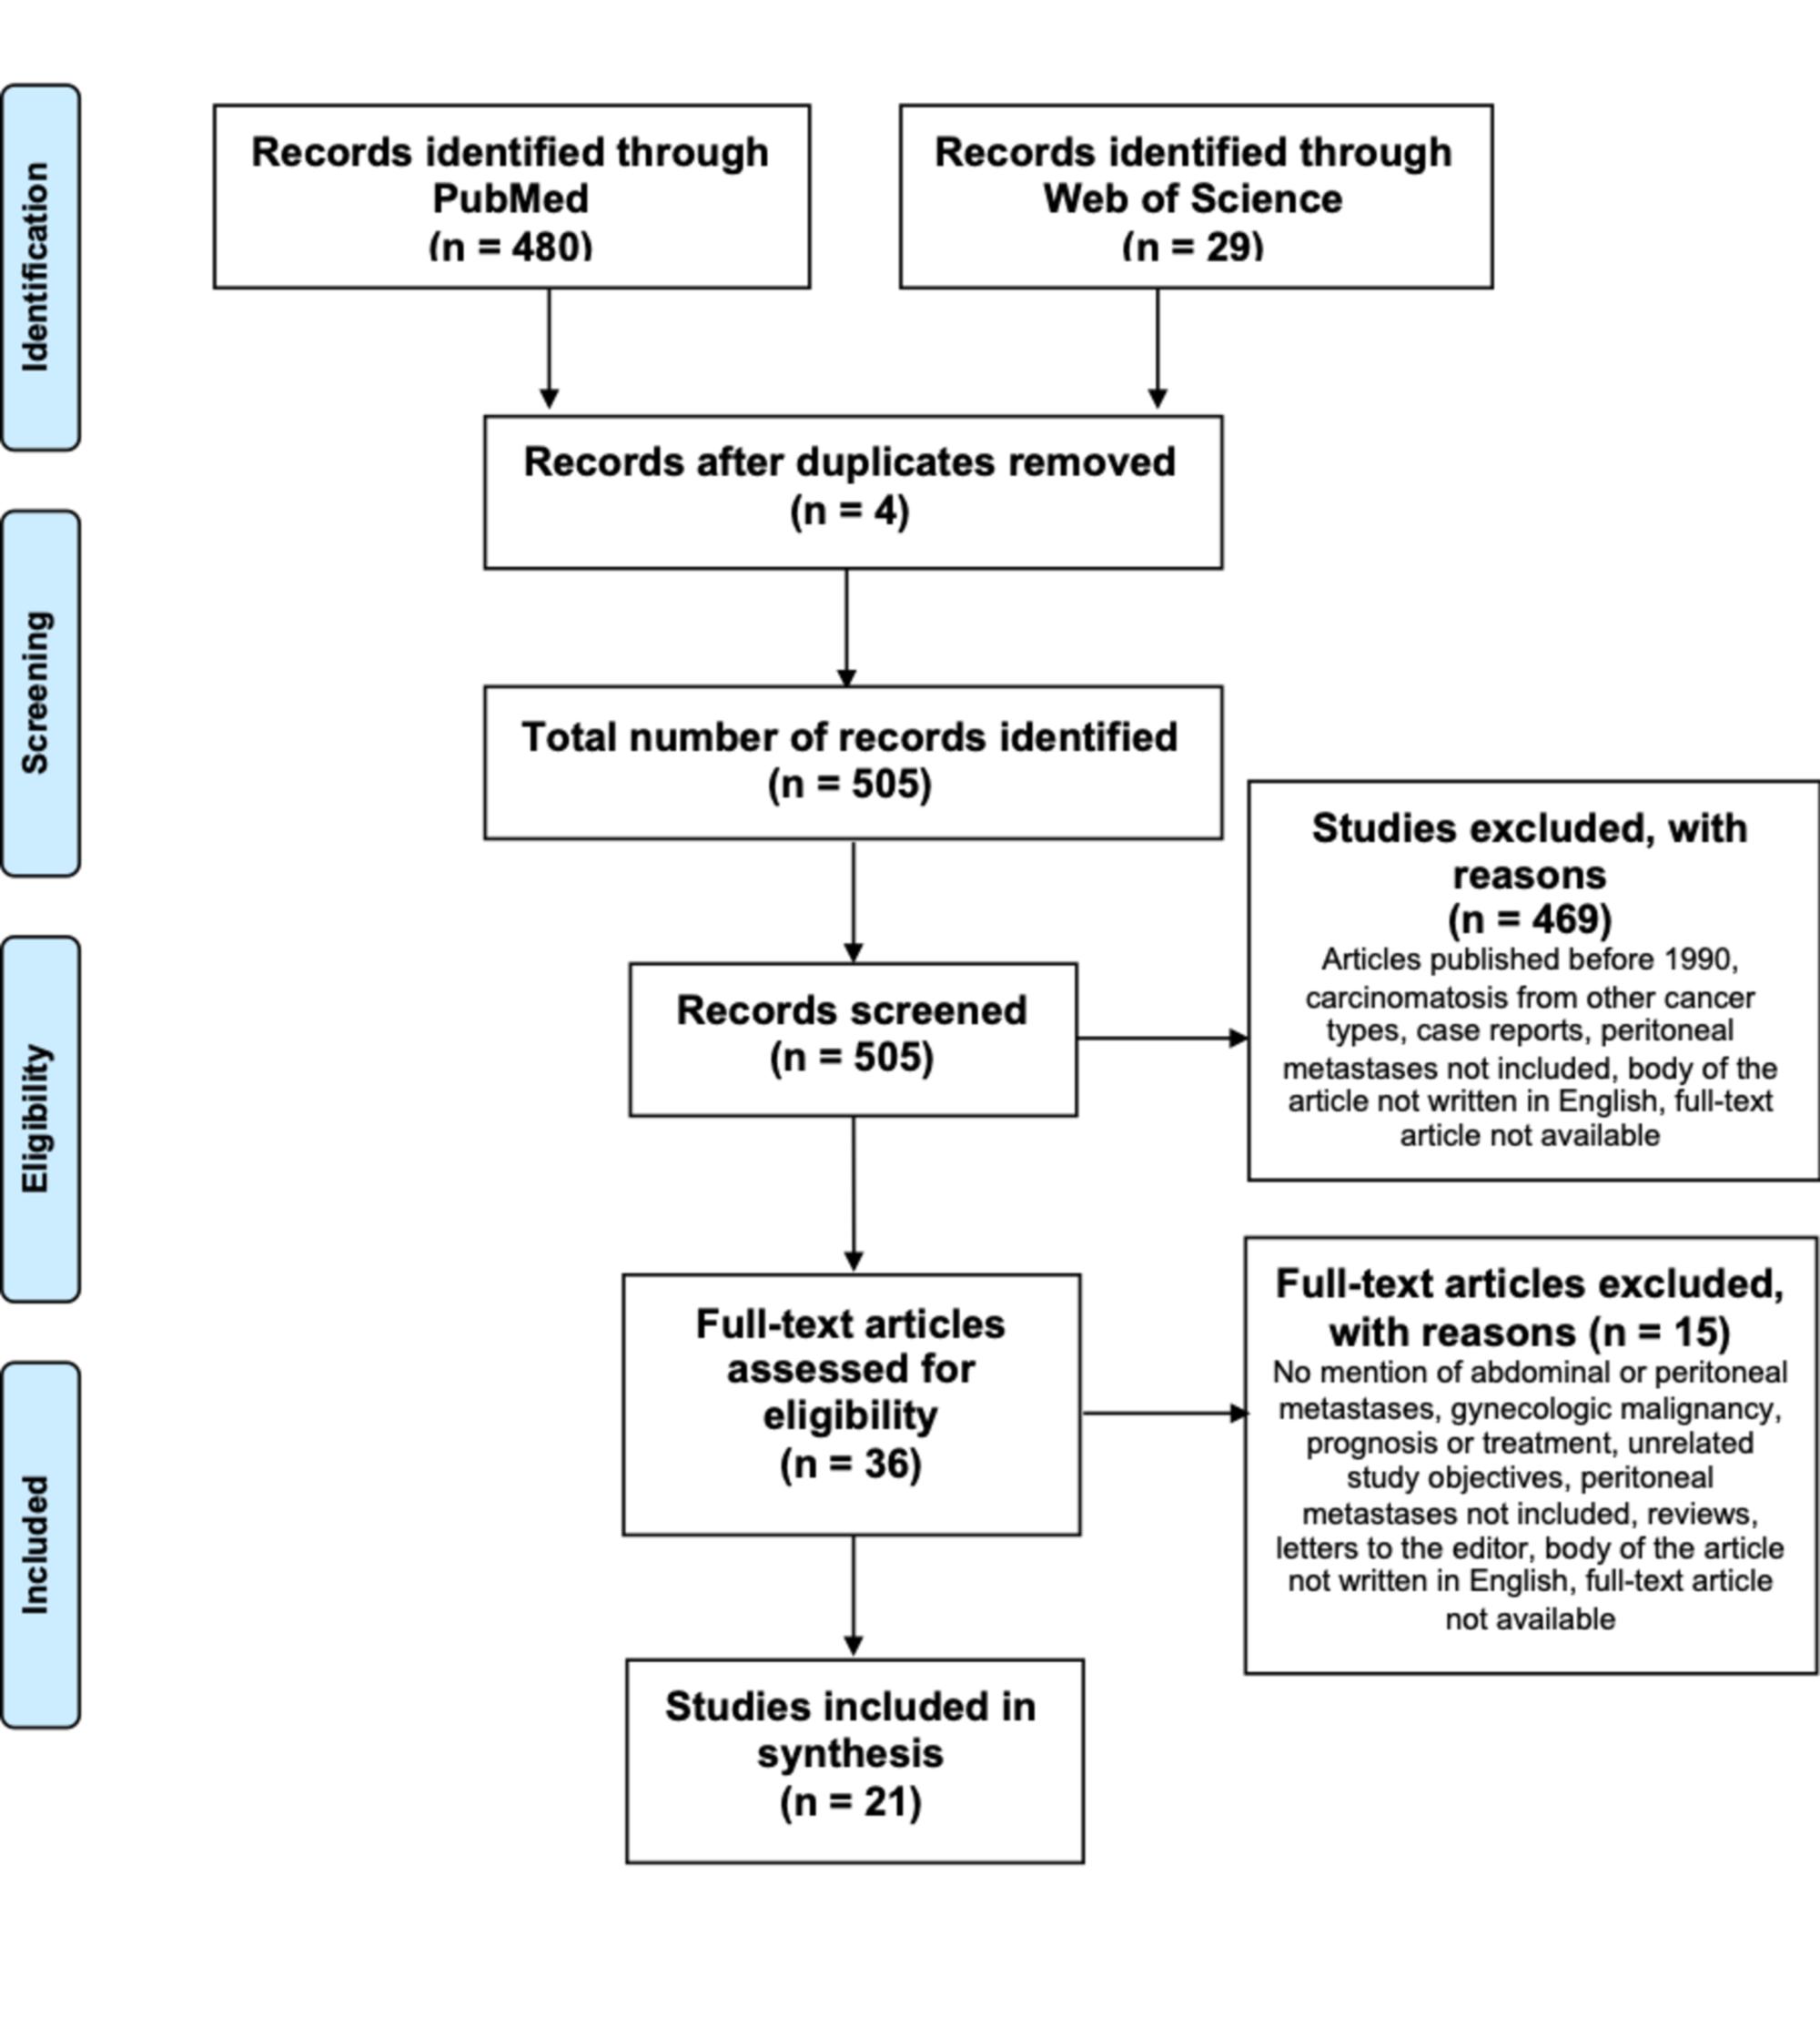 vestibular papillae symptoms parazitii in londra 2019